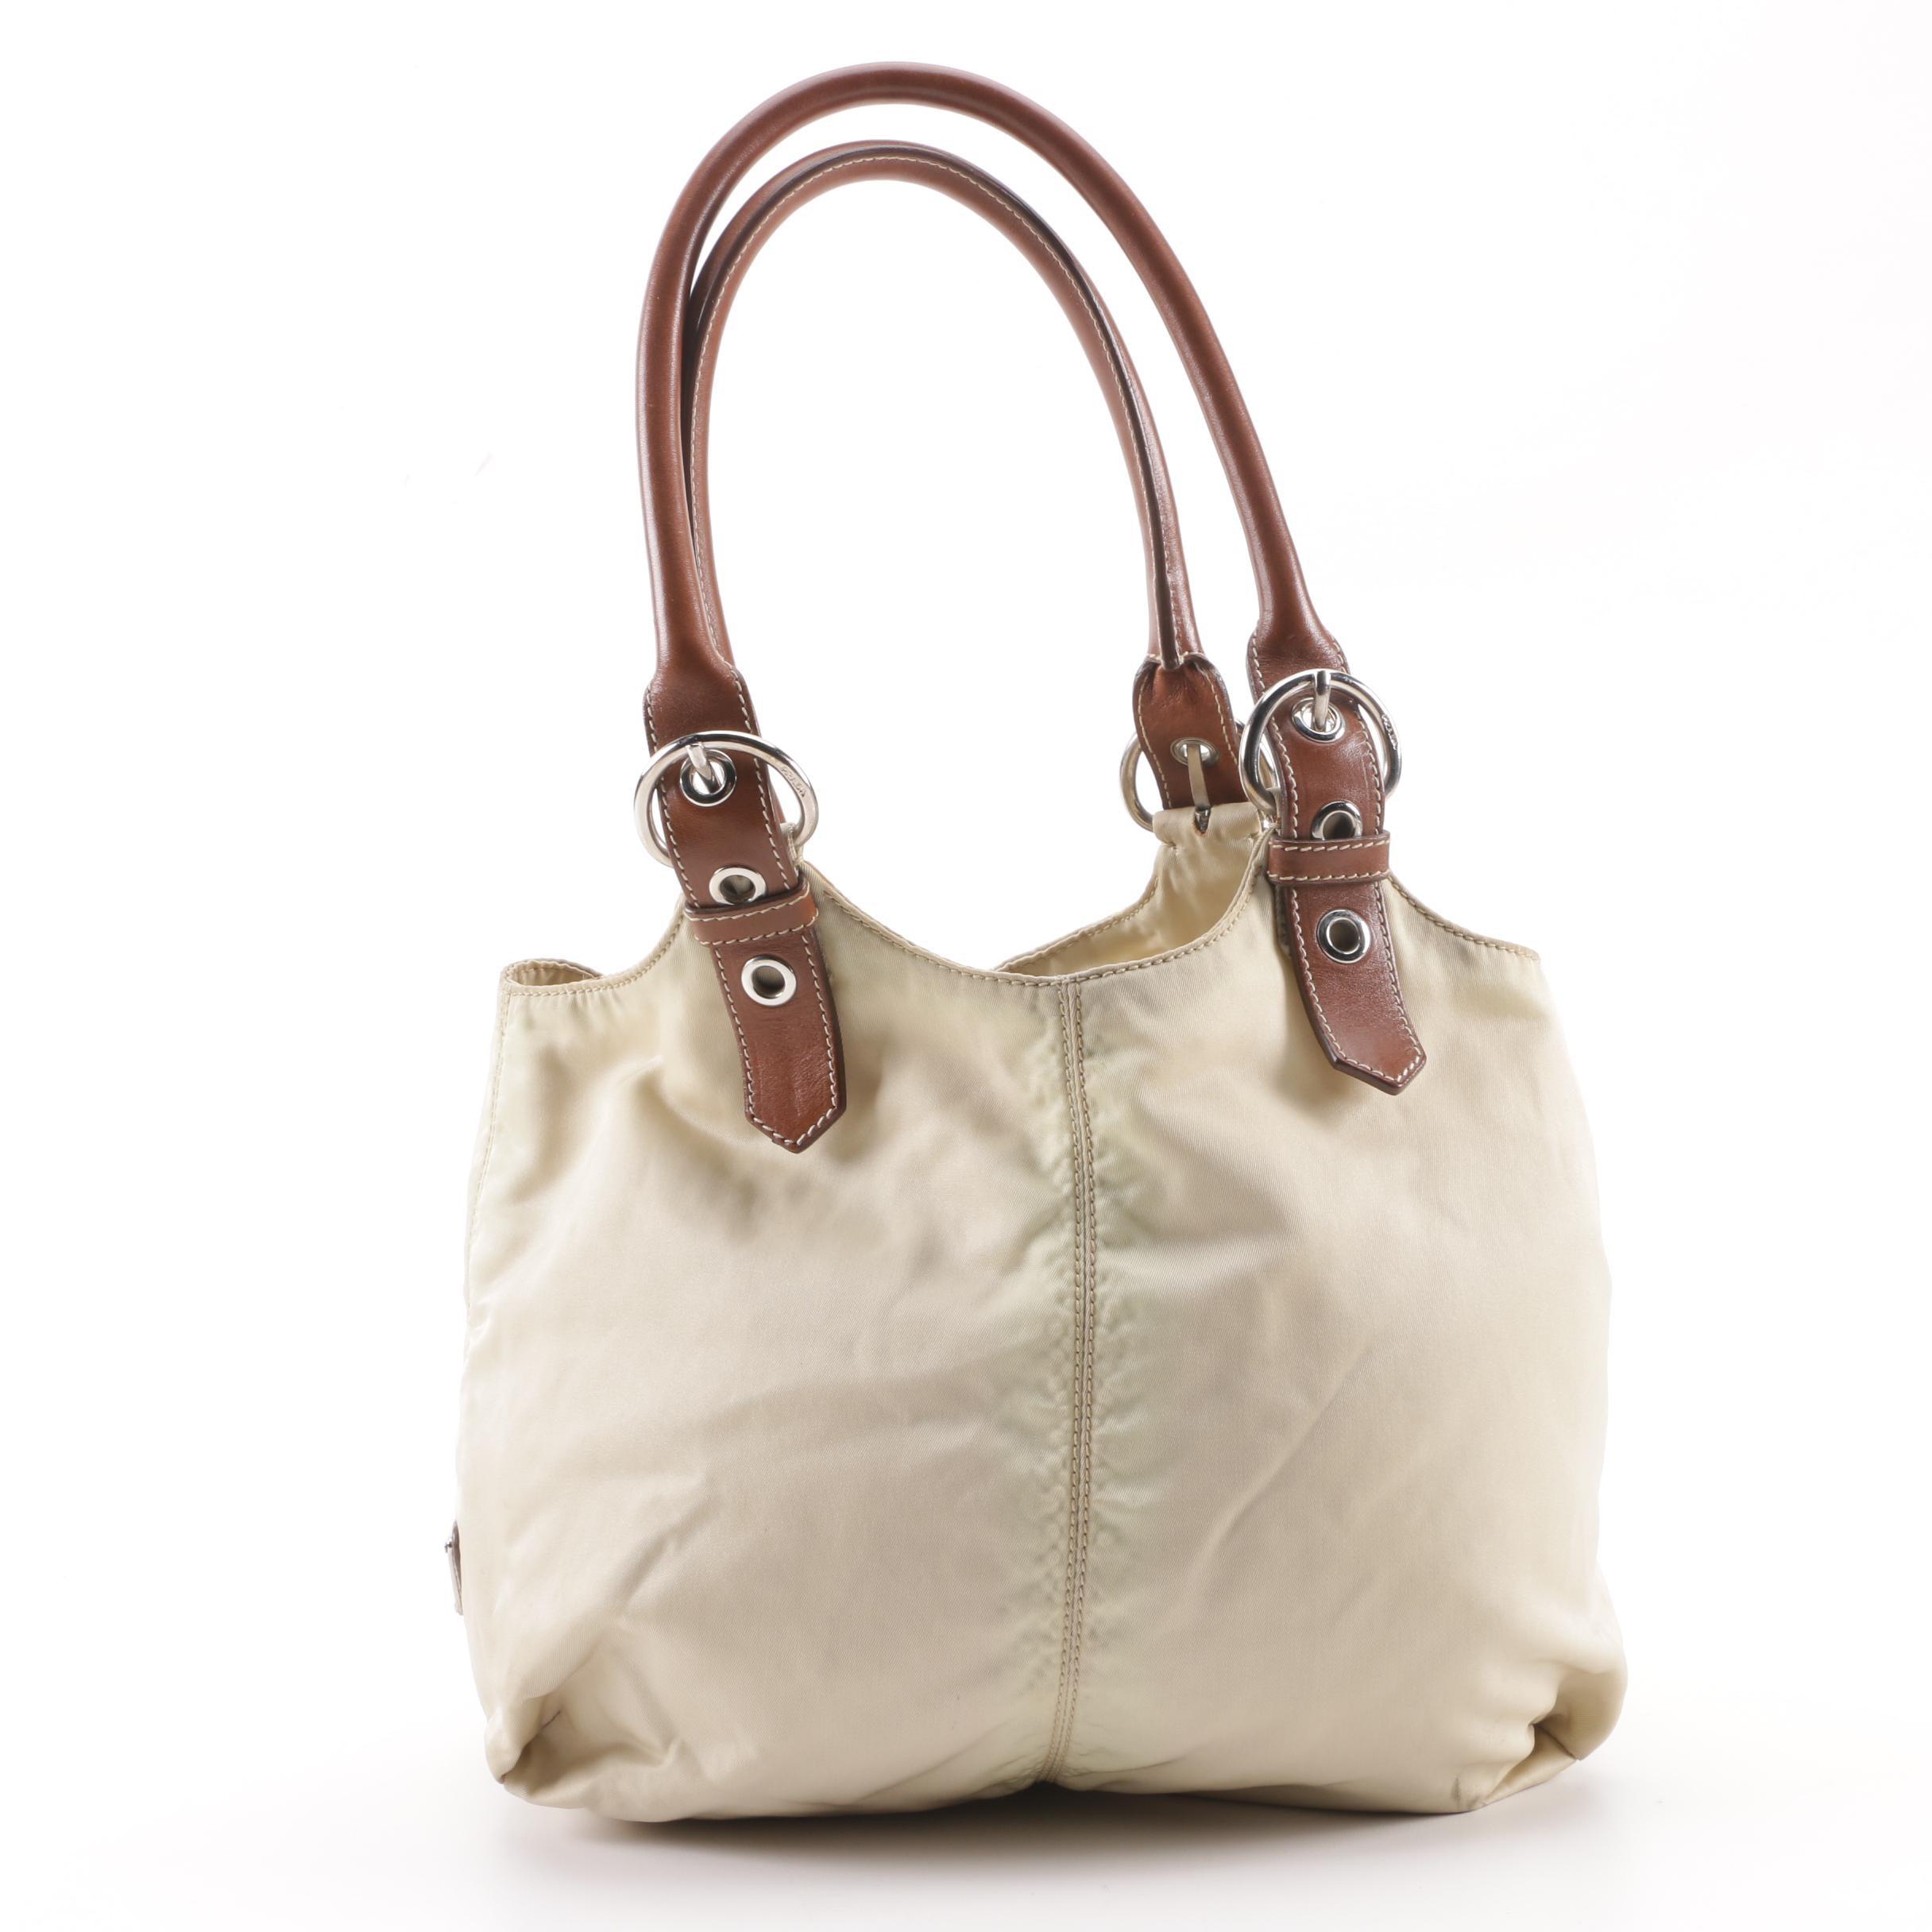 Prada Beige Nylon and Brown Leather Tote